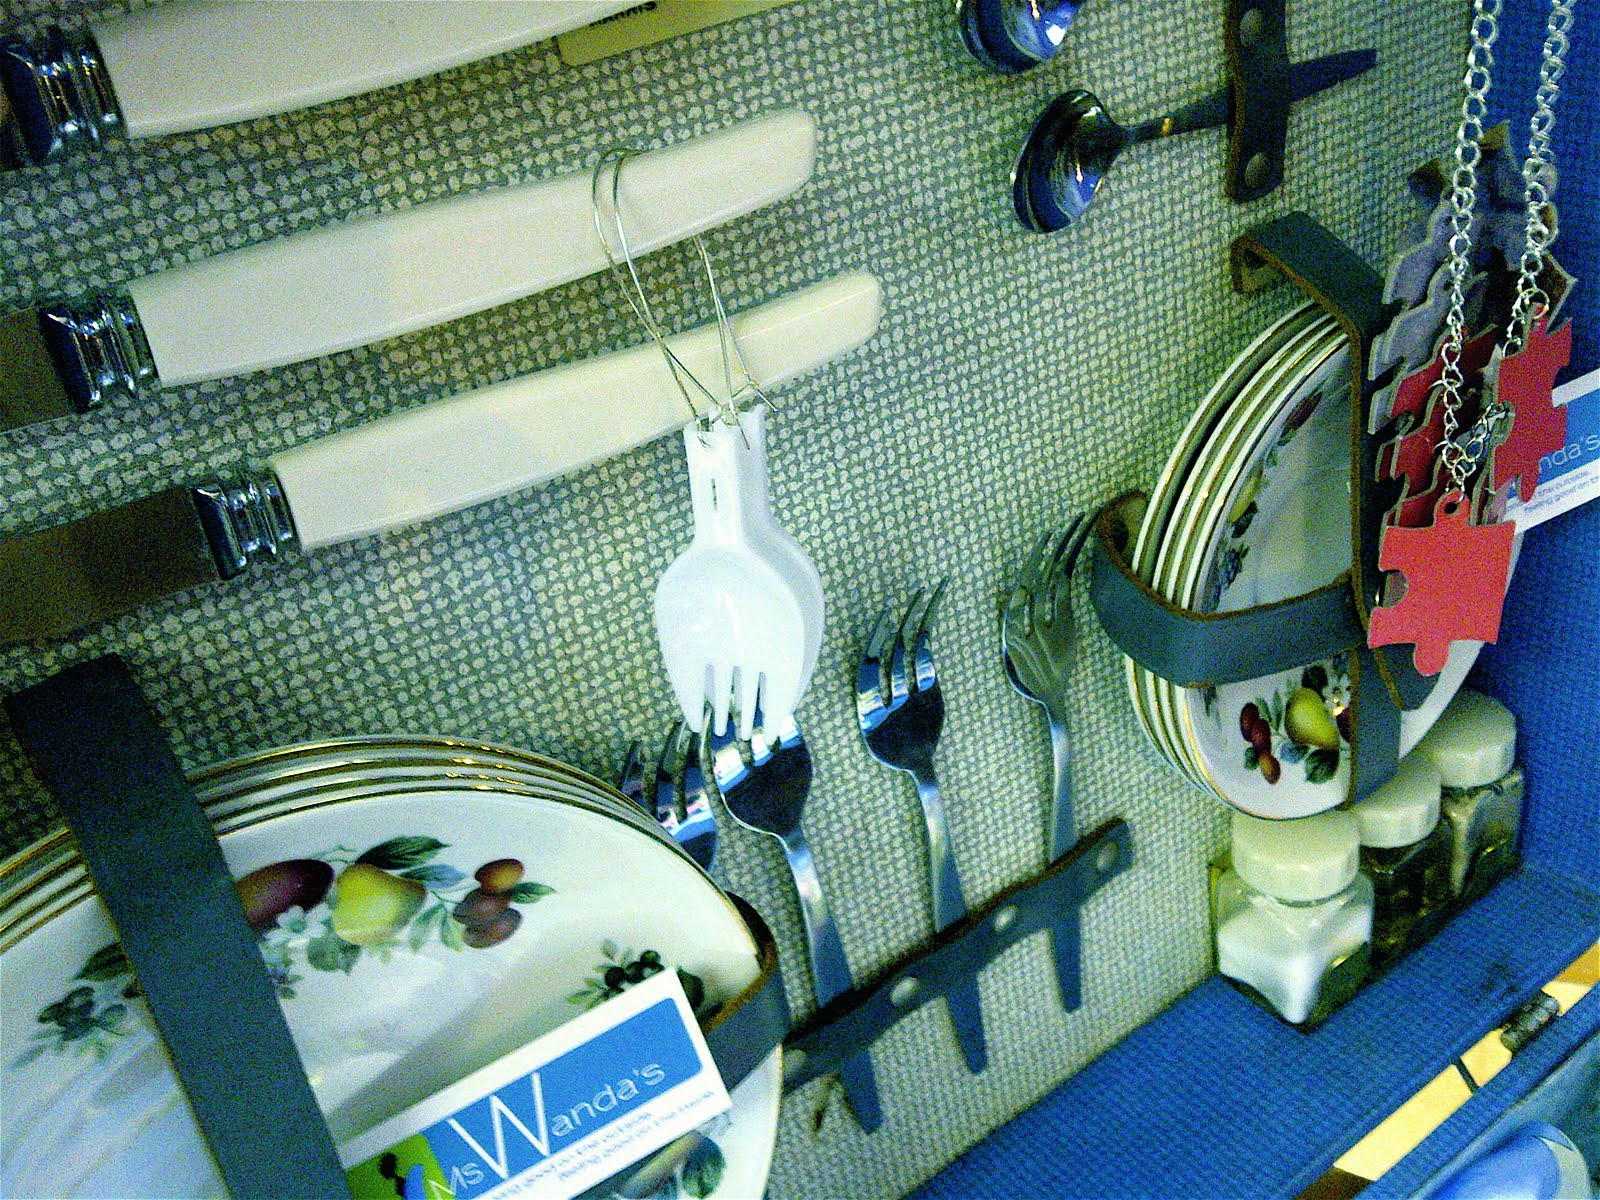 http://1.bp.blogspot.com/-IOgCXRJUm7E/TmoU6xLnYxI/AAAAAAAAAj0/BFVKktWXofc/s1600/my+fork+earrings.jpg